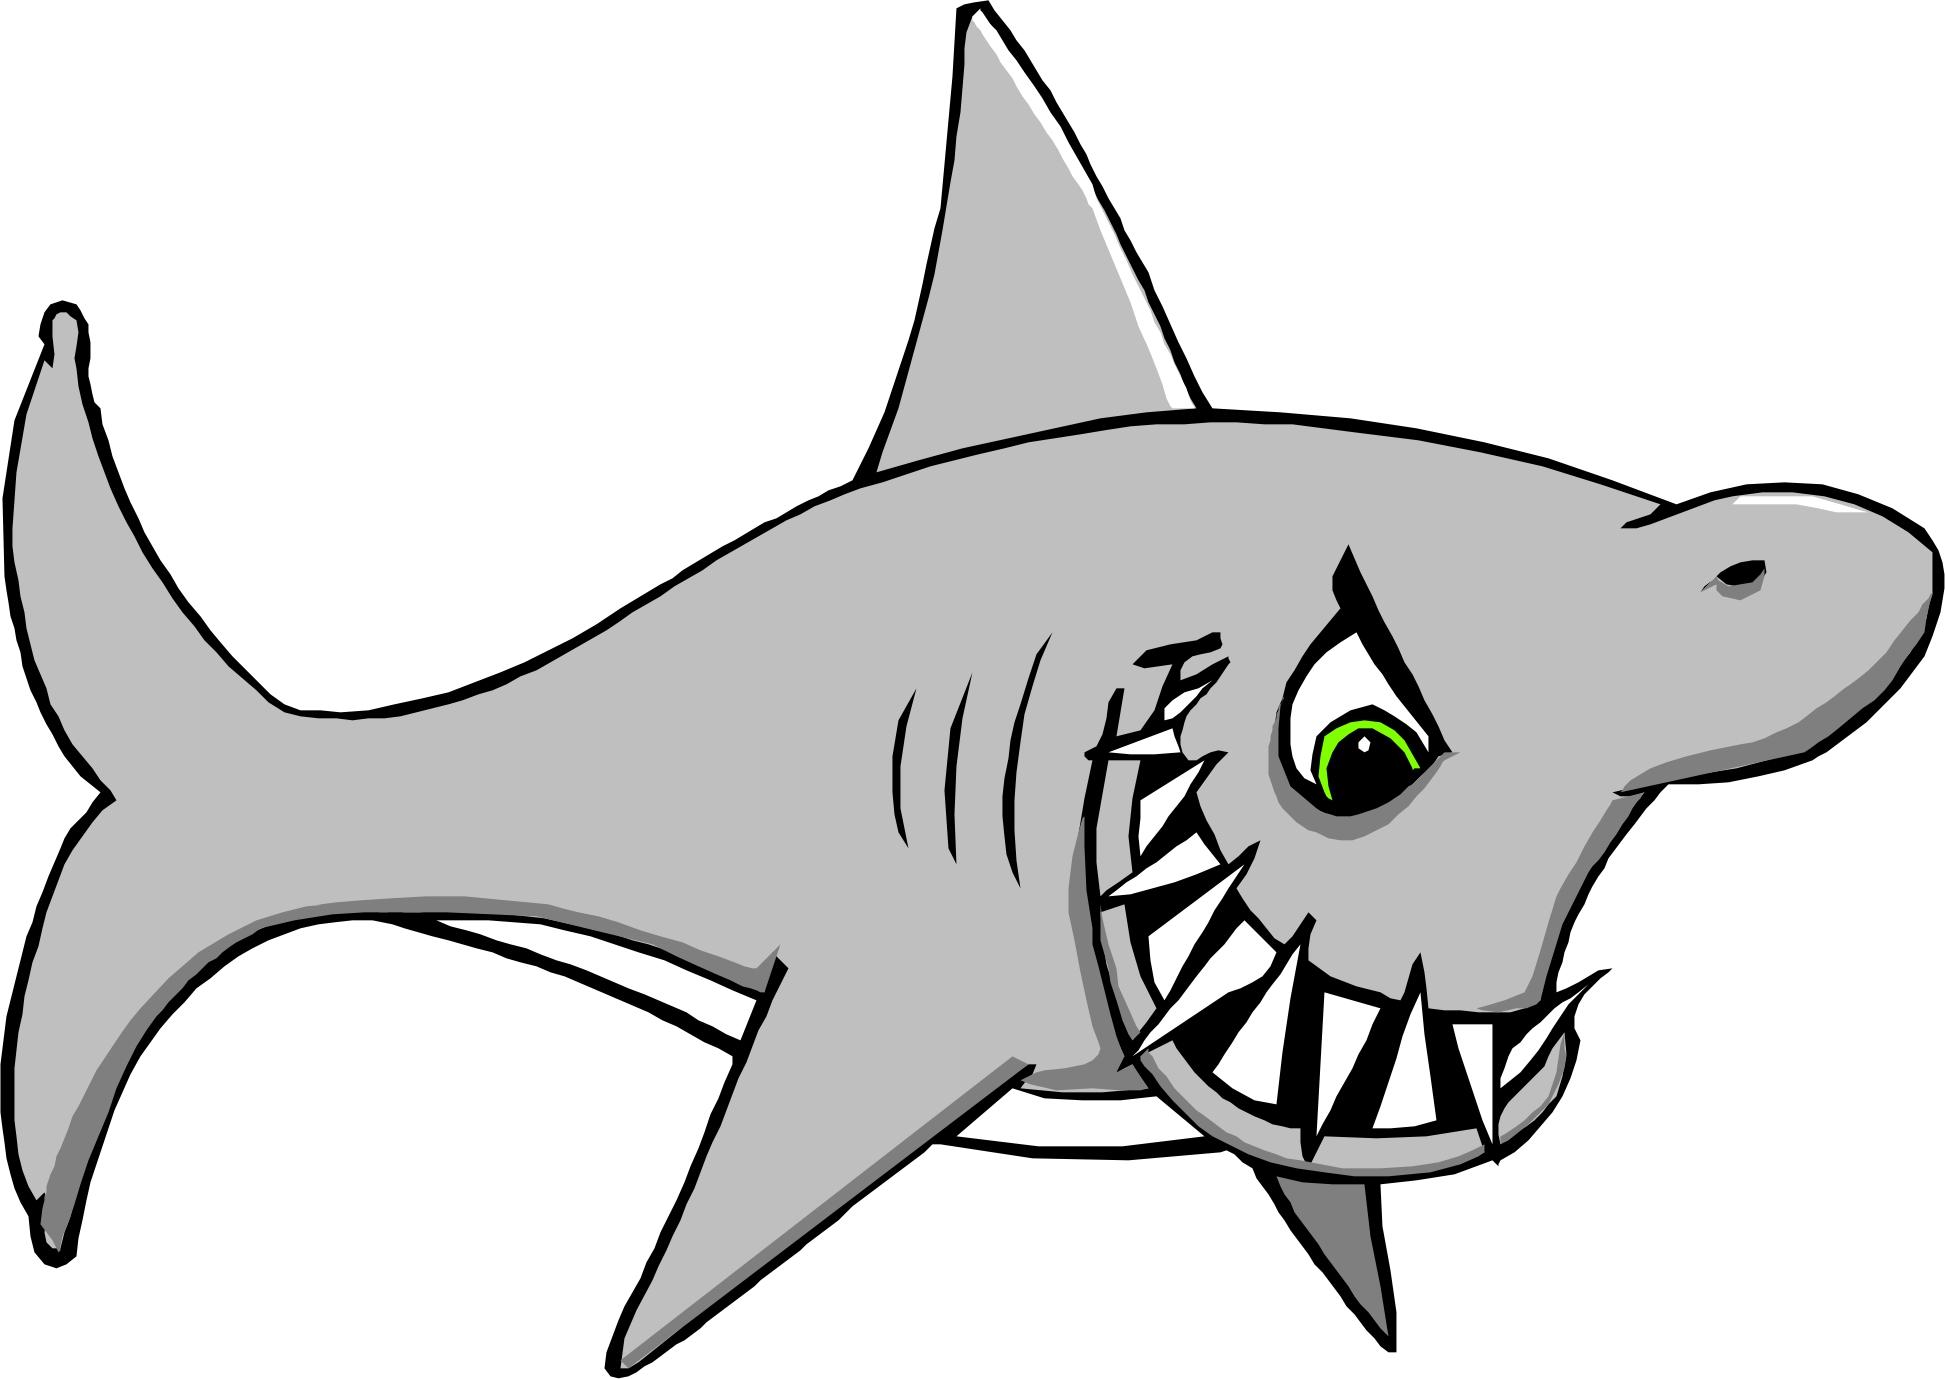 Cute shark clipart black and white - photo#21